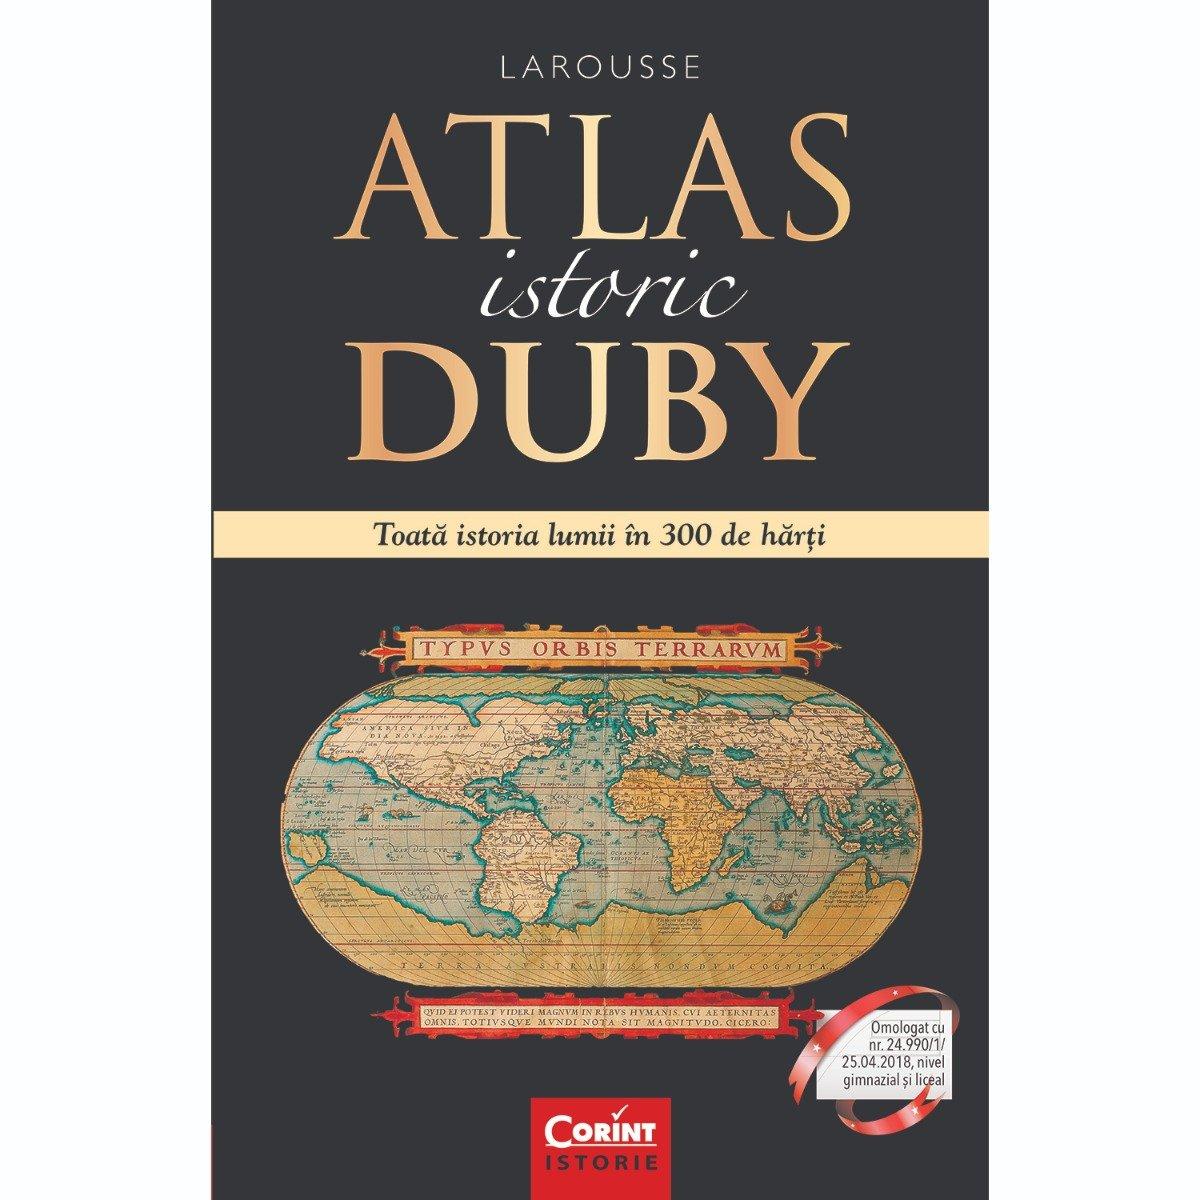 Carte Editura Corint, Atlas istoric Duby Larousse. Toata istoria lumii in 300 de harti, Georges Duby